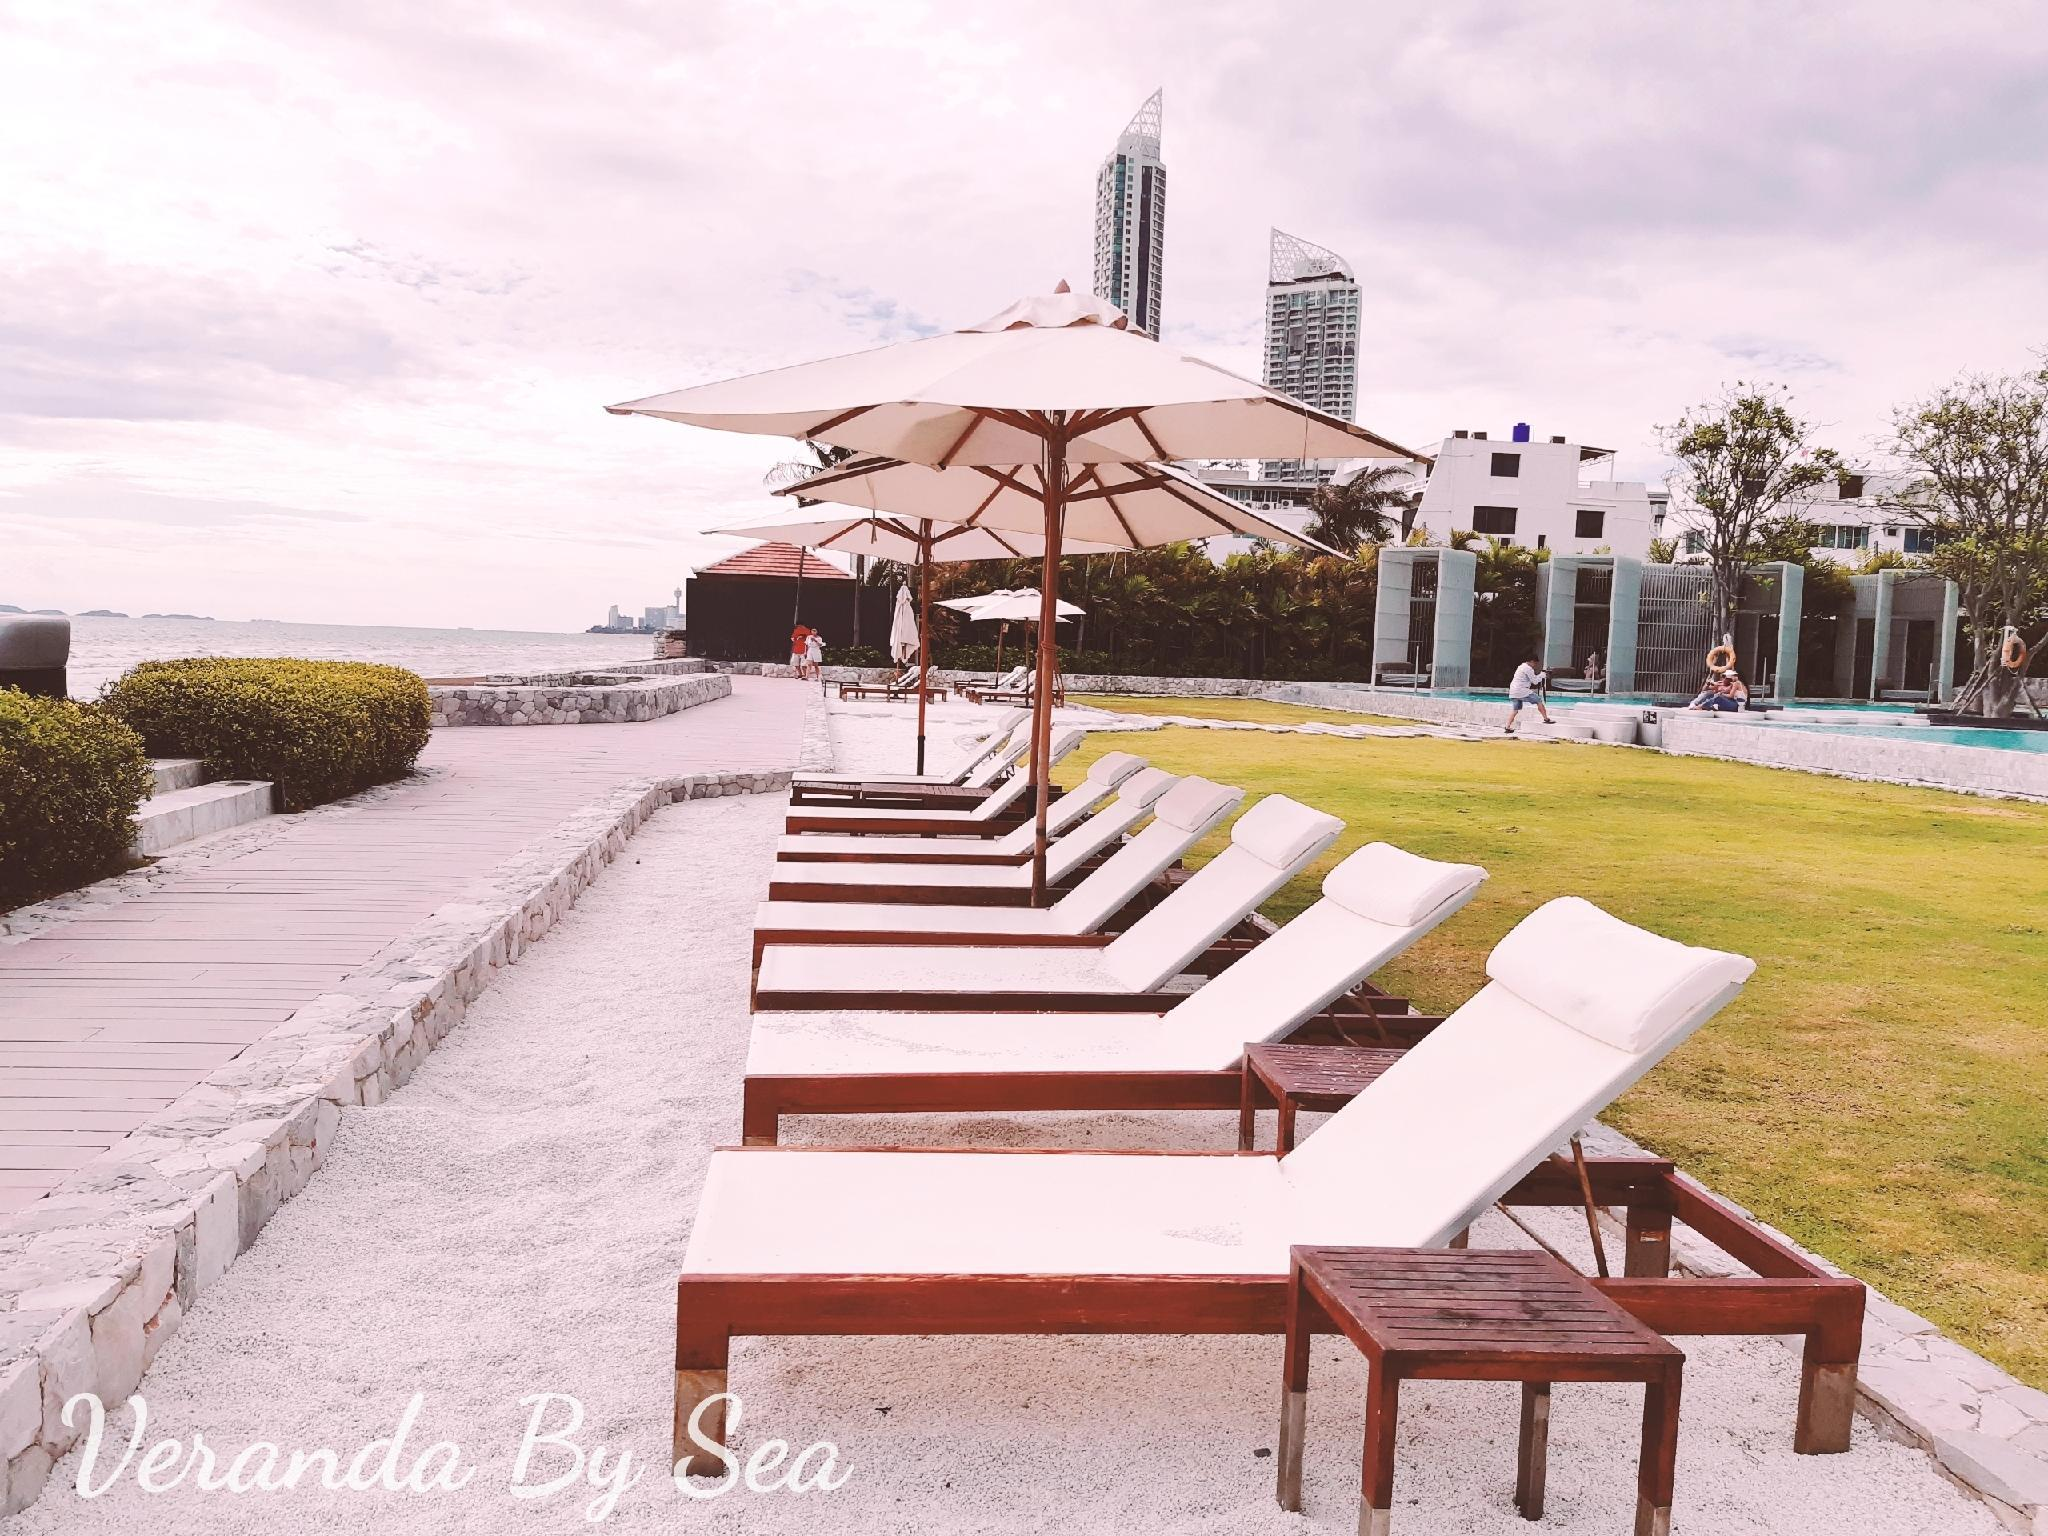 Veranda Residence Pattaya By Sea